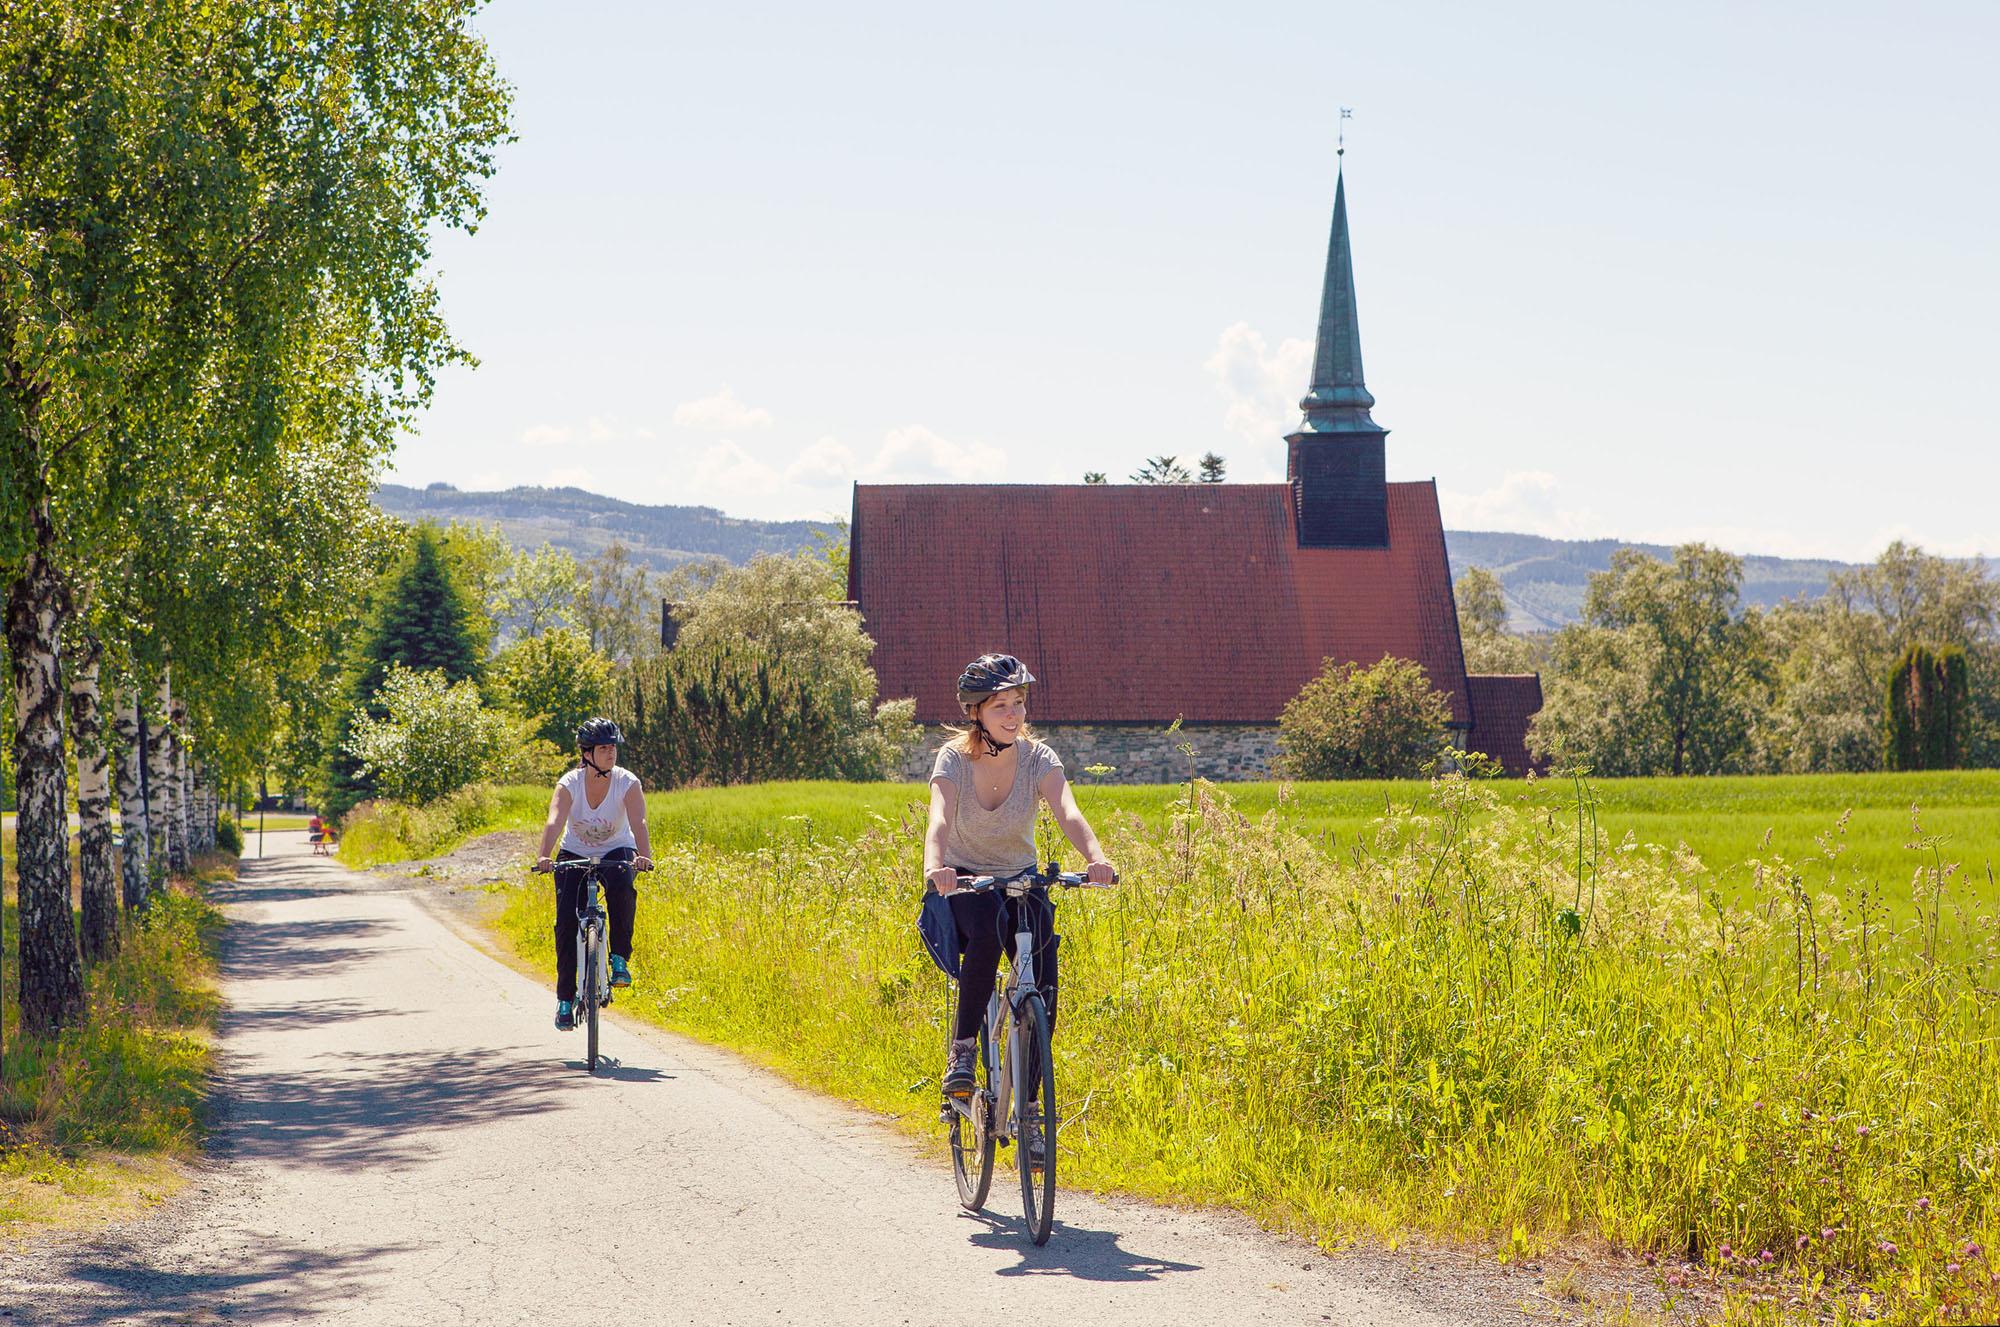 Biking Norway across via Stiklestad. Photo: Steinkjerfotografen